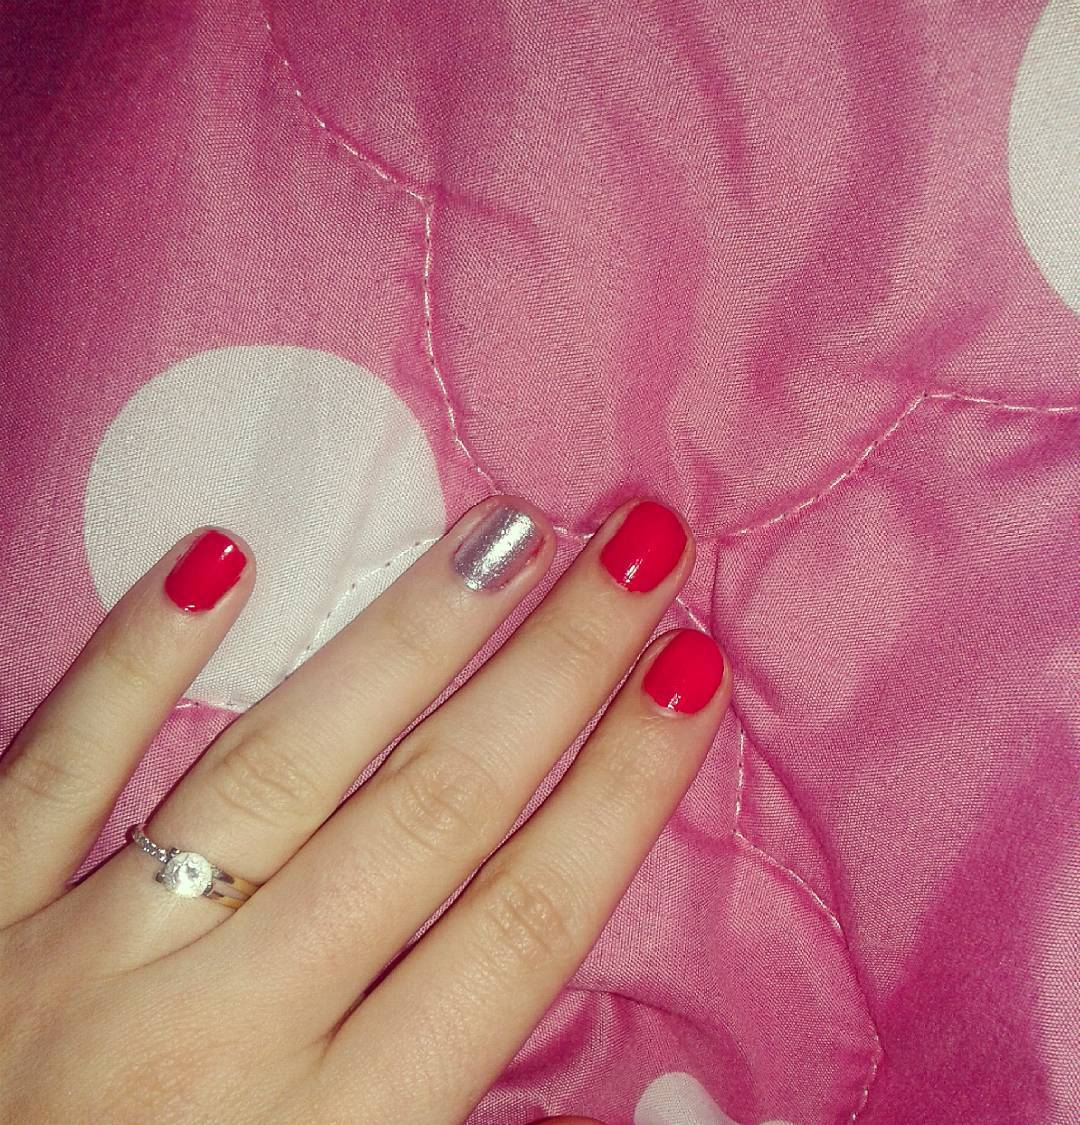 Classy Nail Art Design Looks Simple